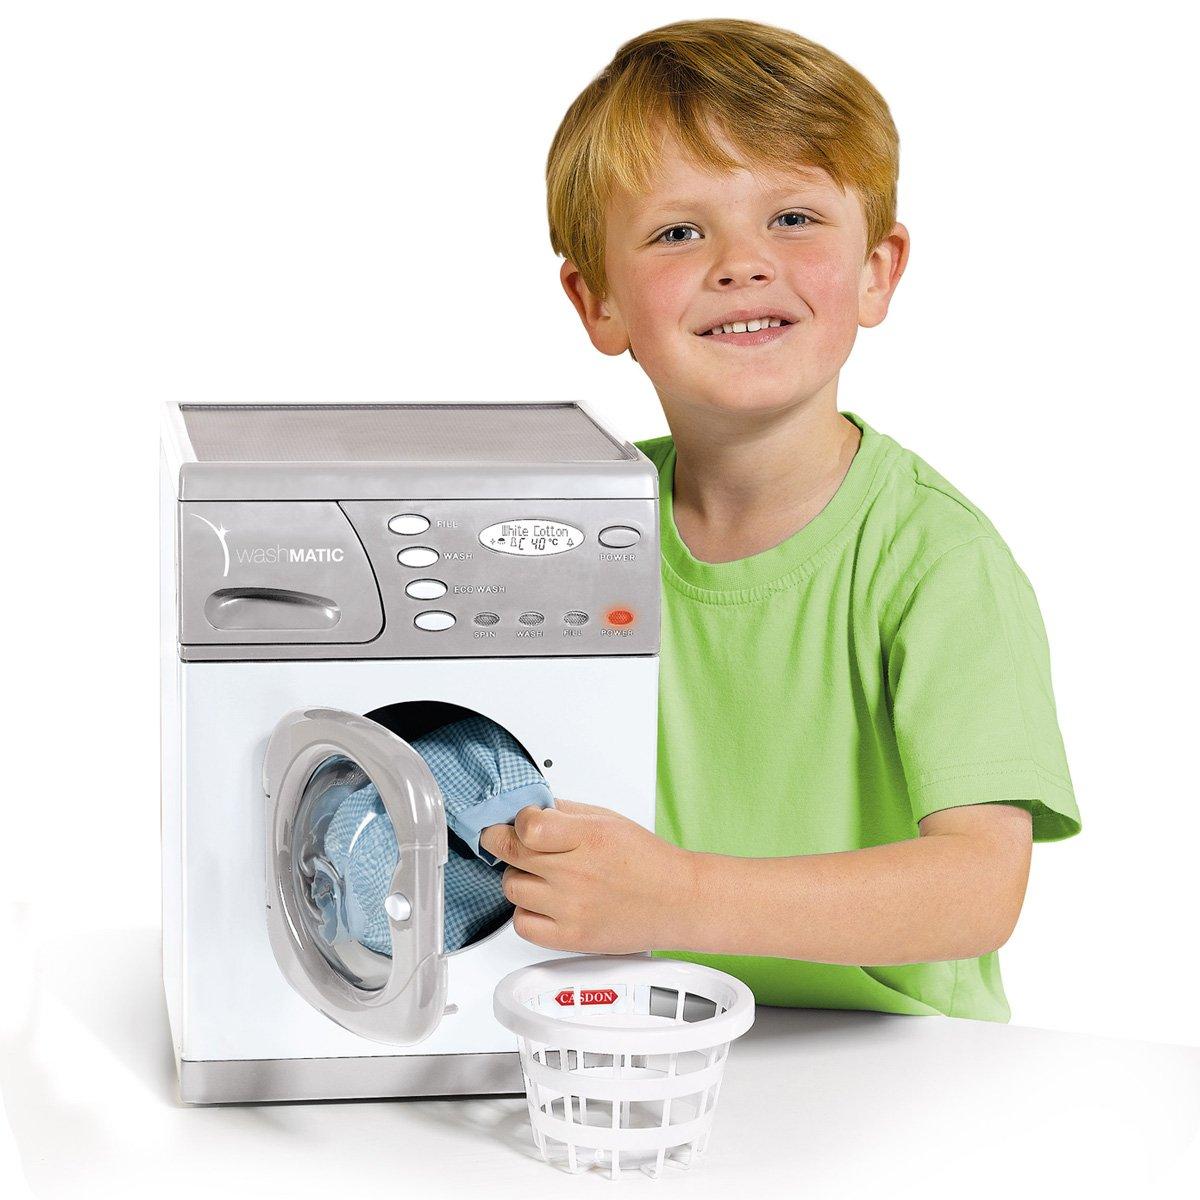 Charles Bentley Casdon 476 Model Electronic Toy Washer Washing Machine With Basket & Powder Box Age 3+ Years